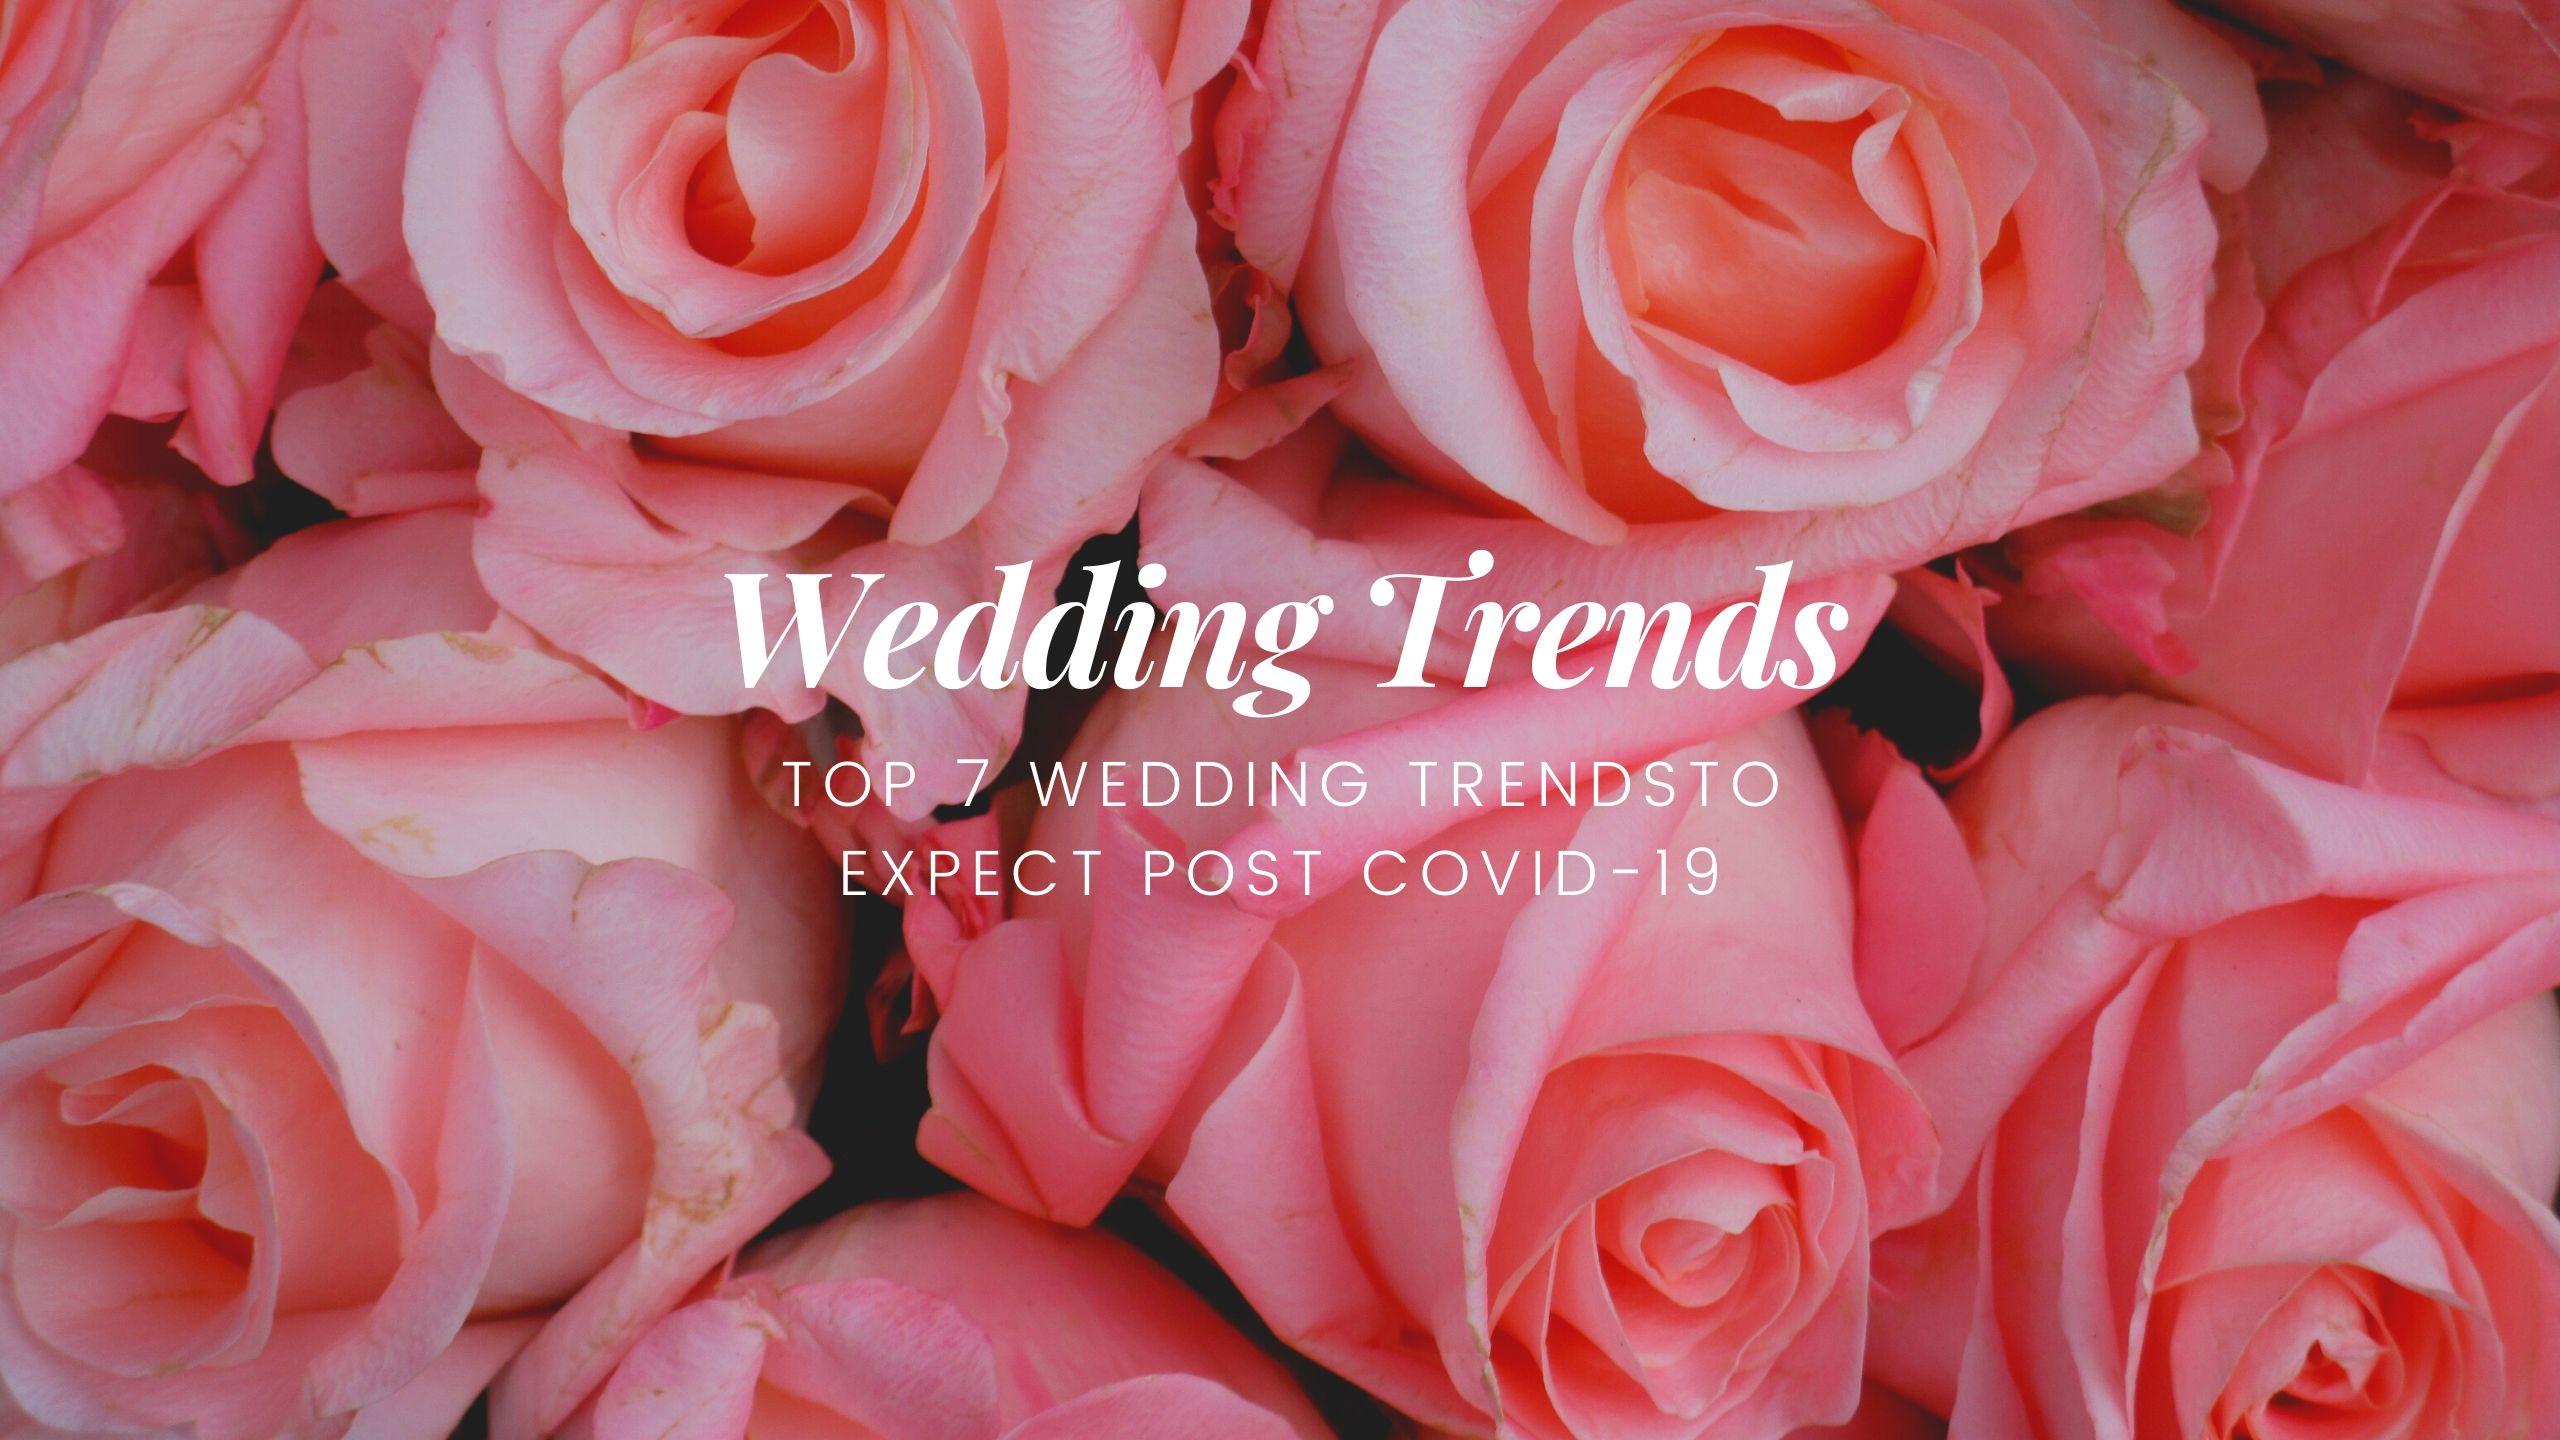 Wedding Trends Post Covid-19